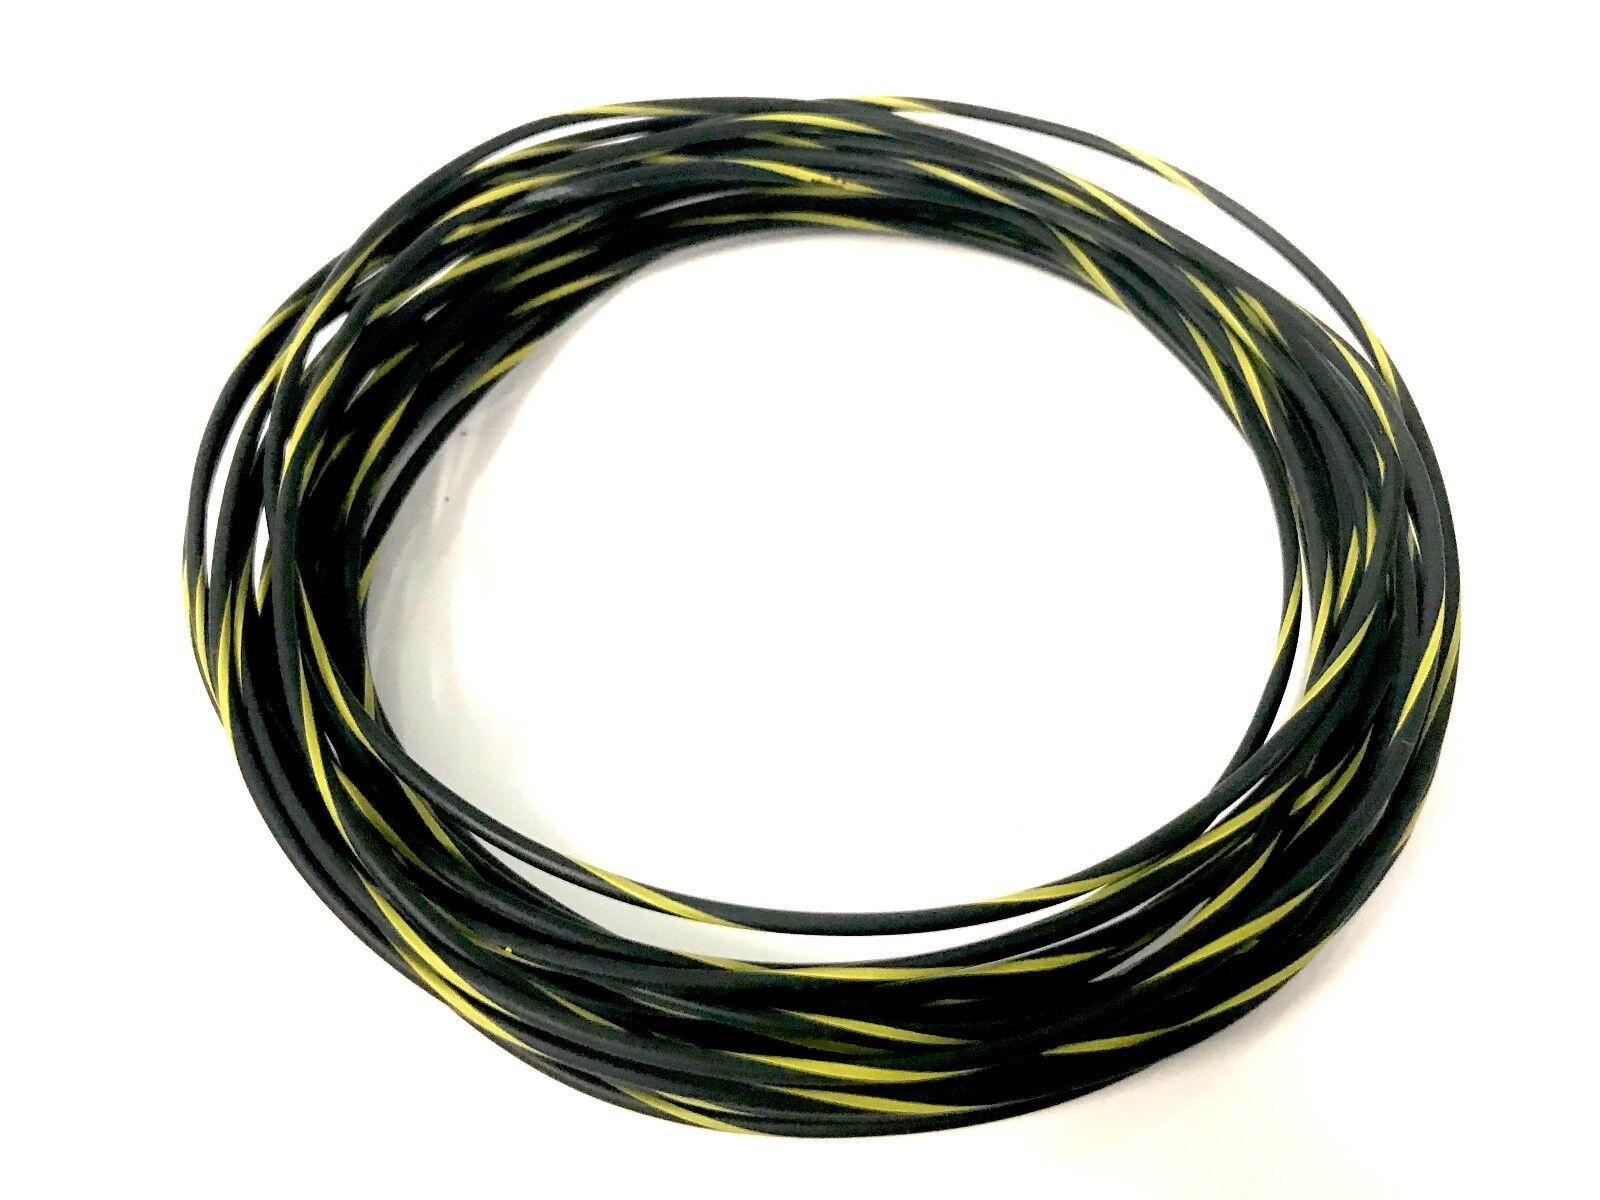 Reel Of 500 Feet Automotive Wire 18 Awg High Temp Txl Wire Black W